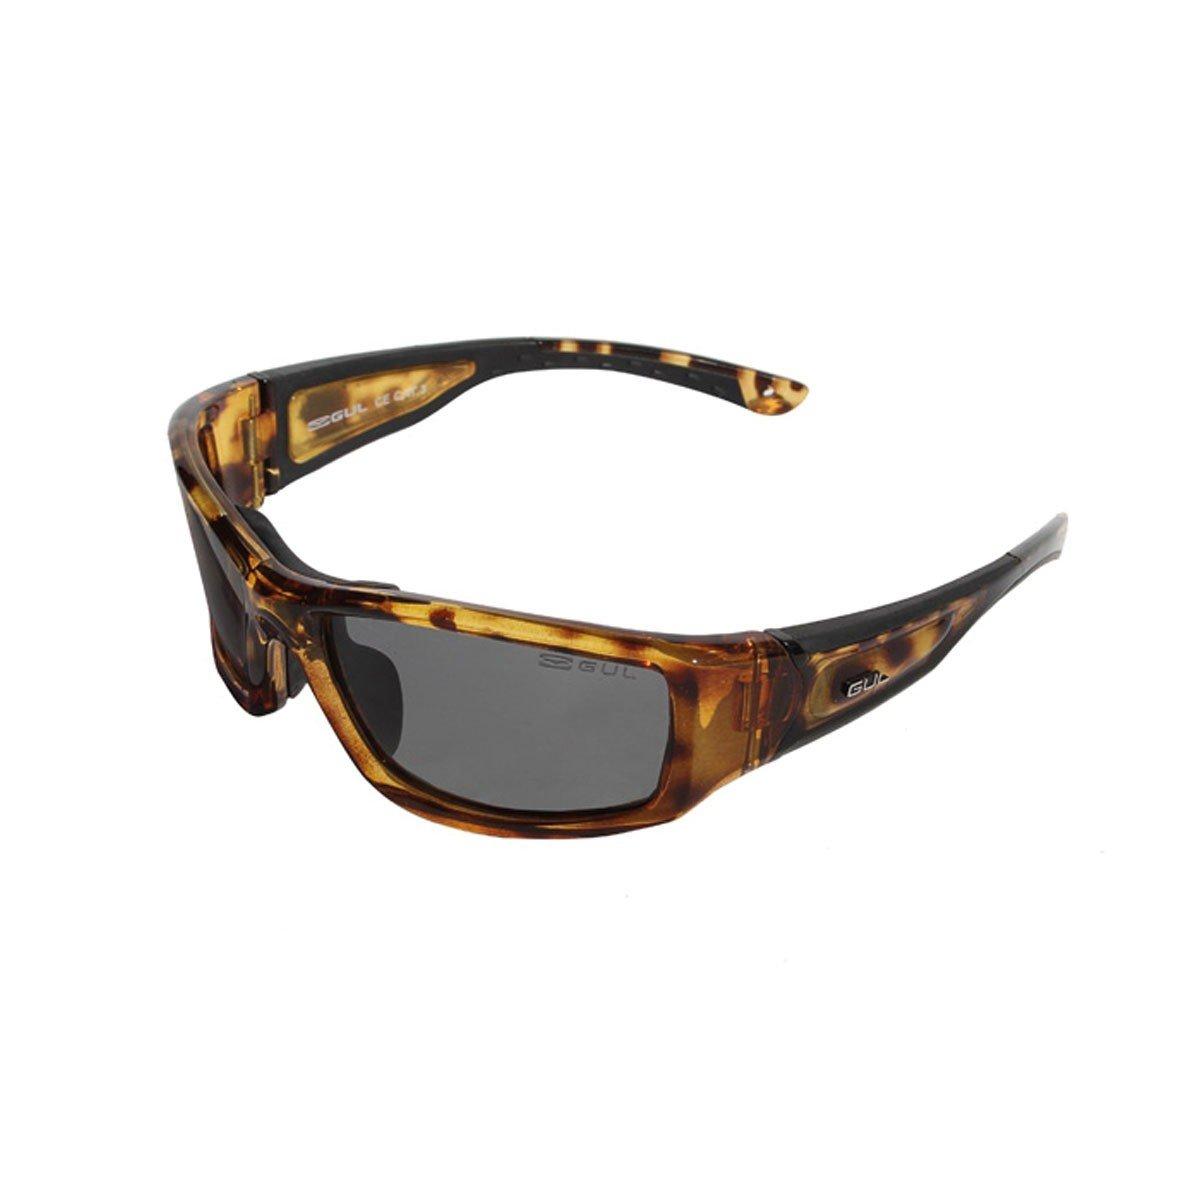 Gul Cz Pro Floating Sunglasses   Sg0001-A3